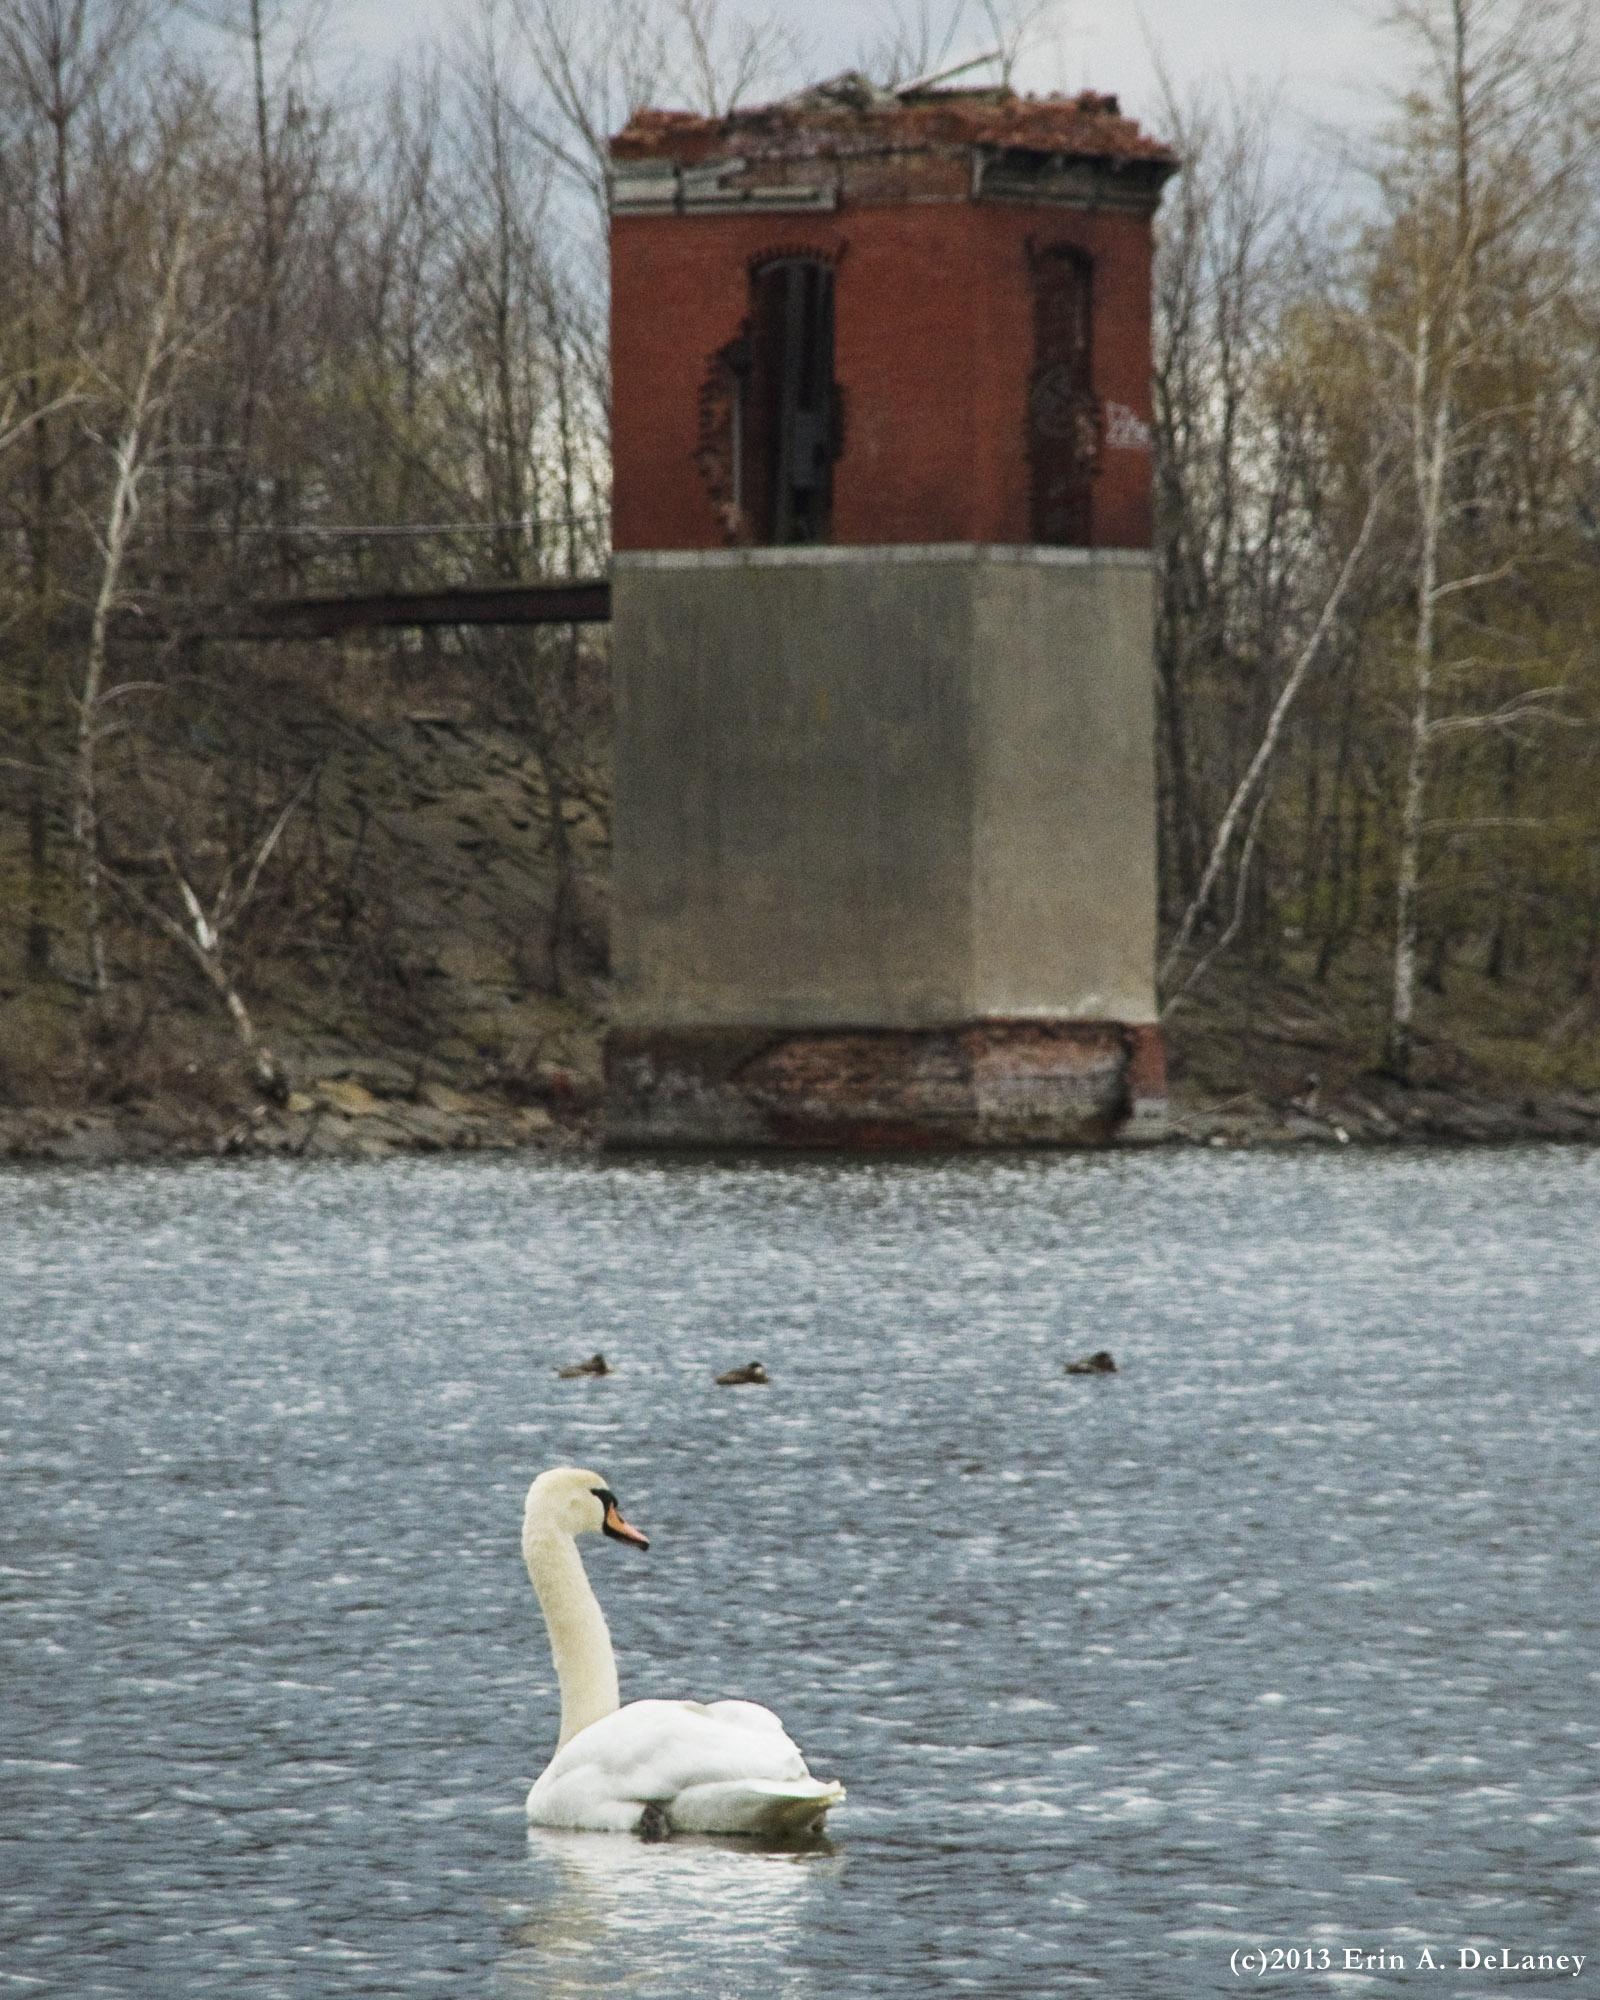 Swan and Screenhouse JC Reseroir, 2013